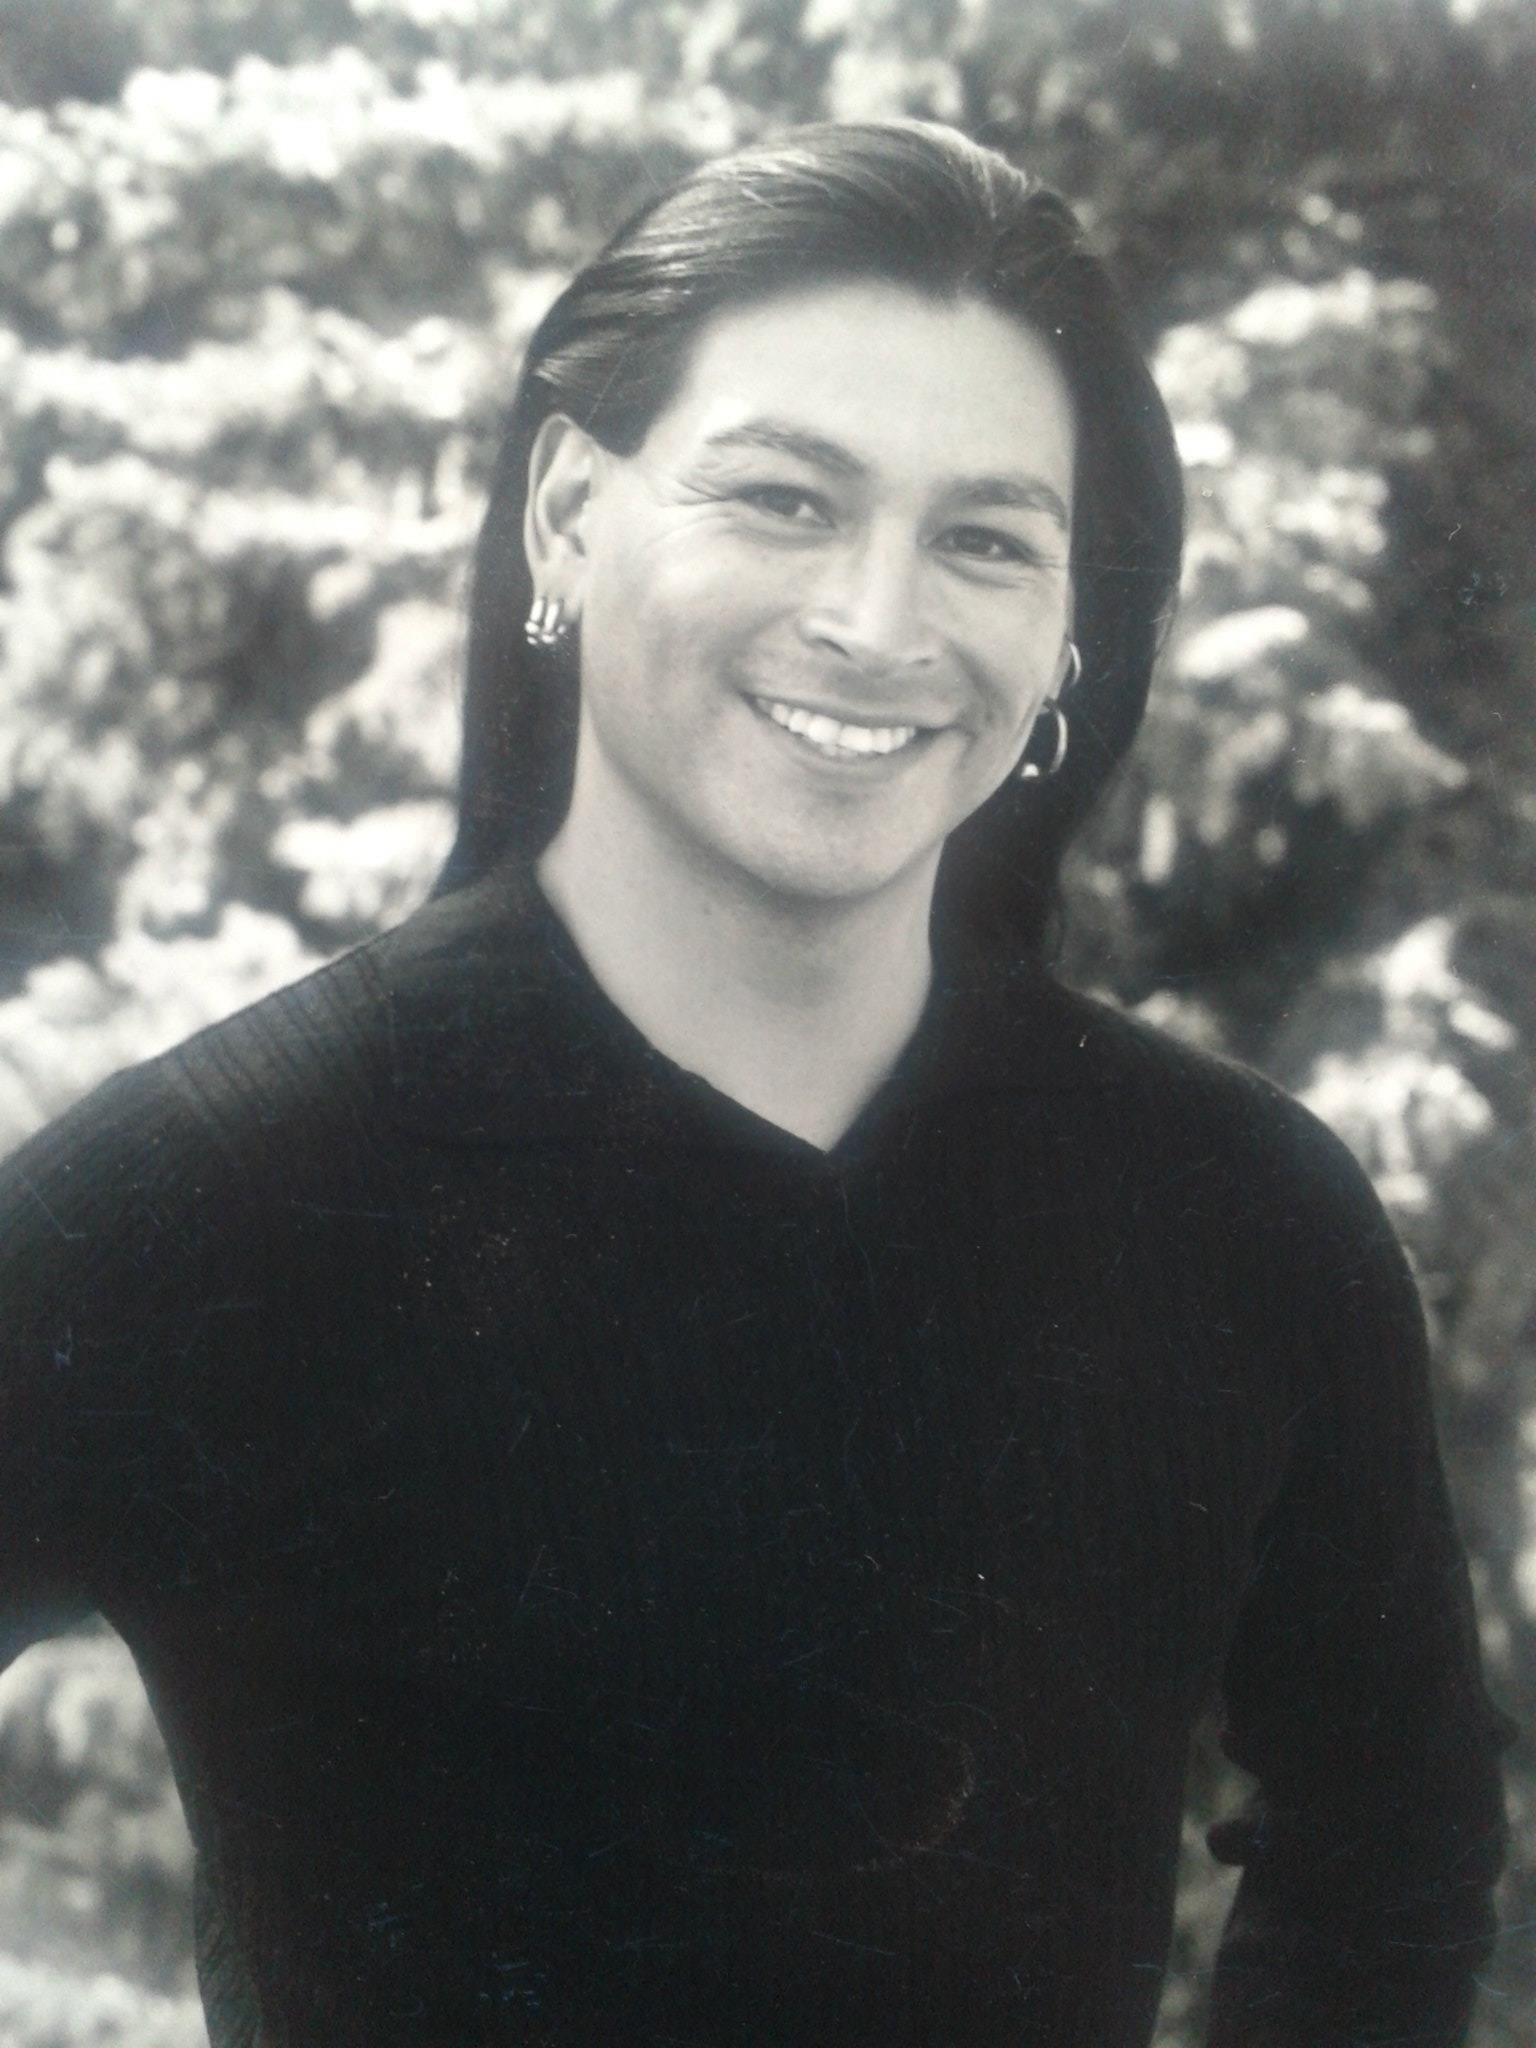 David Martinez Mountain Child Northern Arapaho Native American Actors Native American Models Native American Men